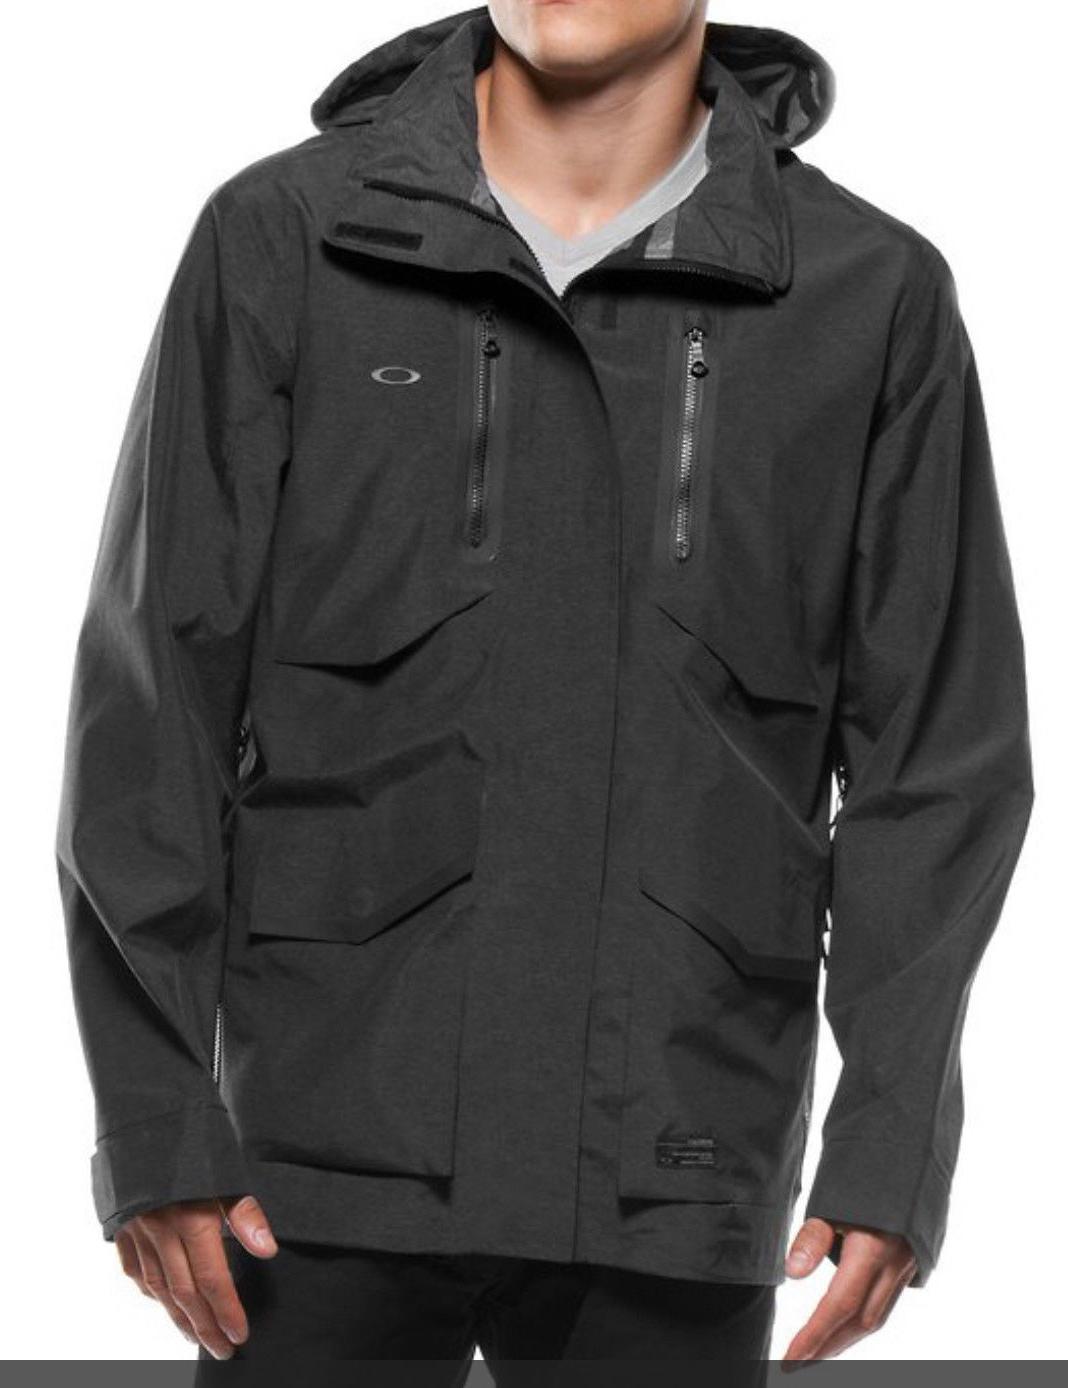 crown zip jacket men s size l